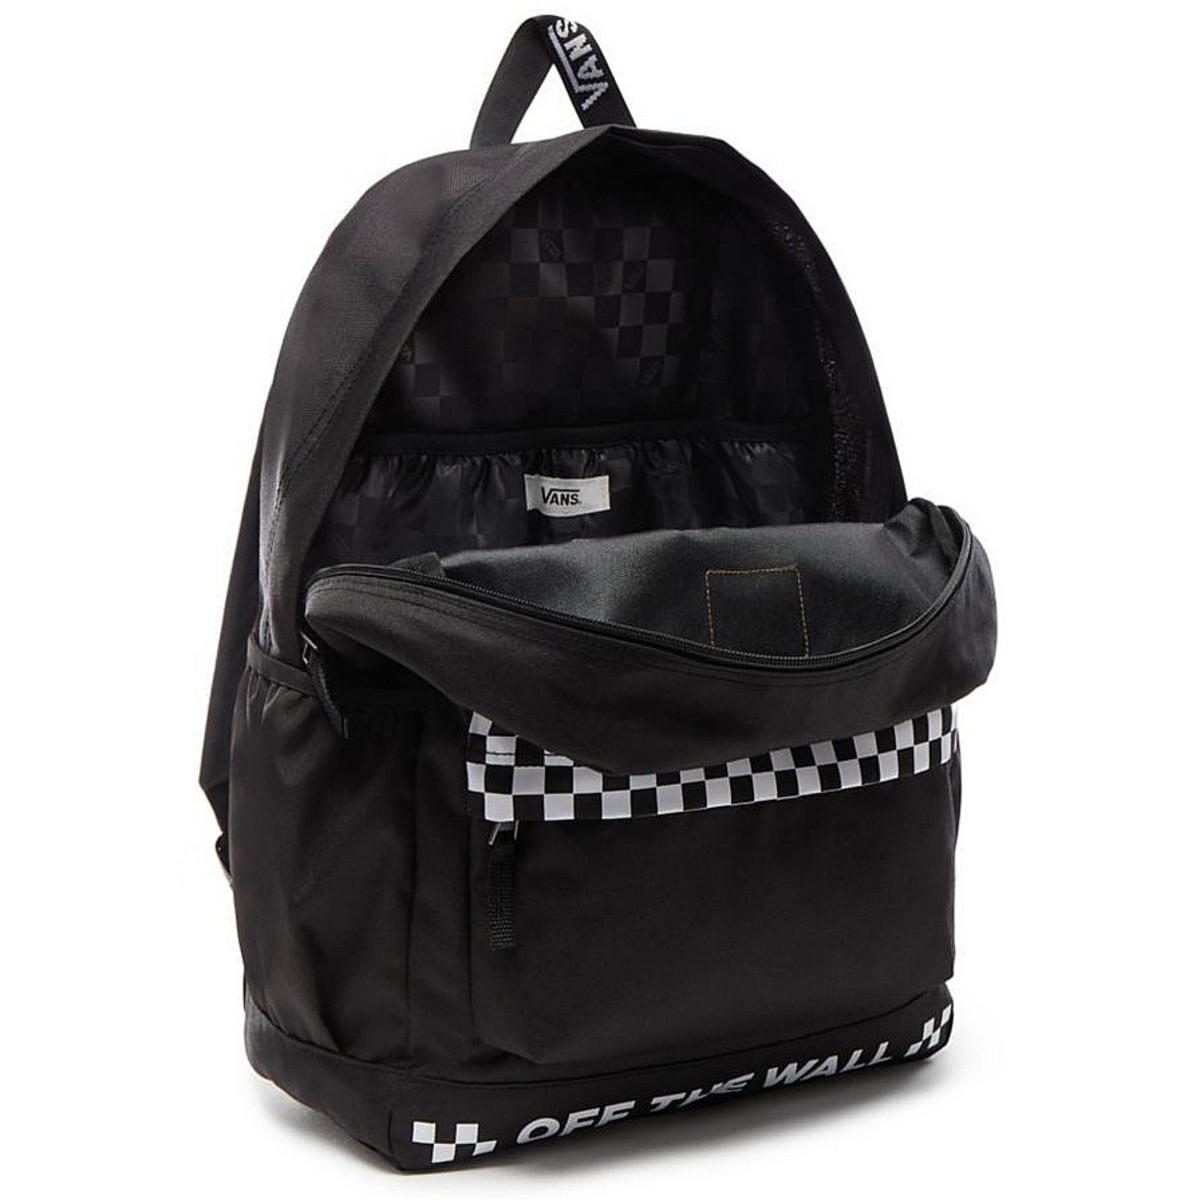 8d8d1f85df Backpack VANS - WM SPORTY REALM PLUS - Black - VN0A3PBIBLK - metal ...